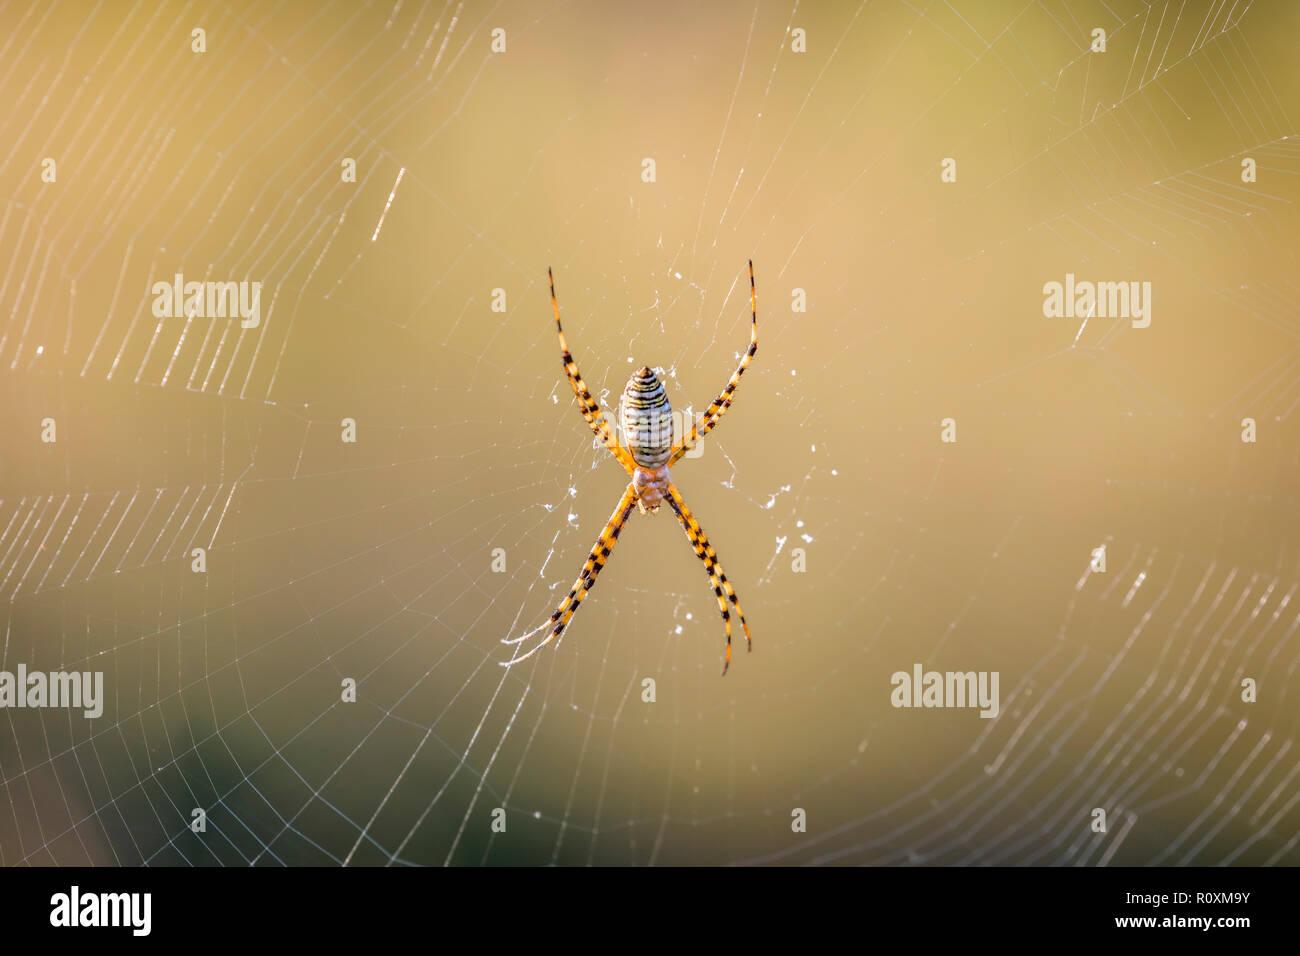 Cerca de la araña de tela de araña Foto de stock